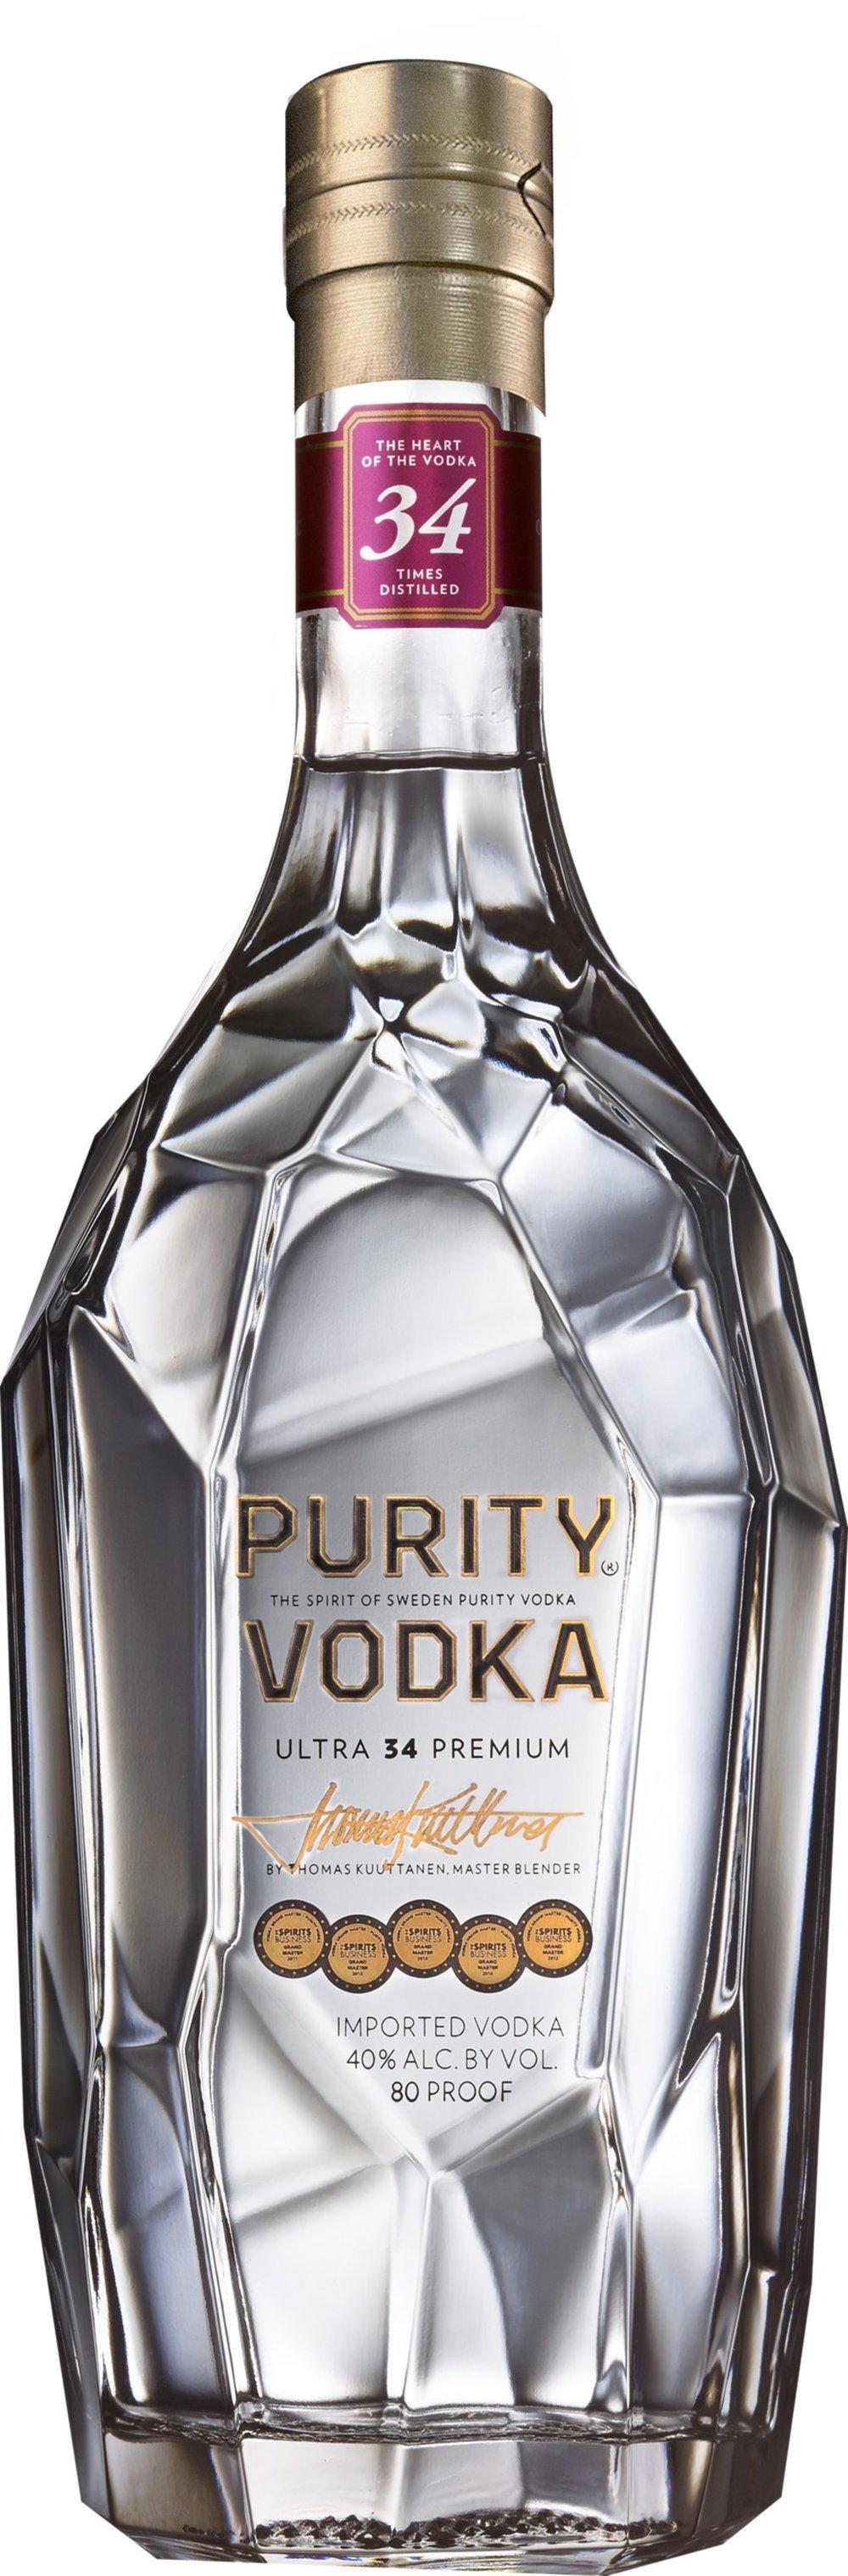 purity4.jpg